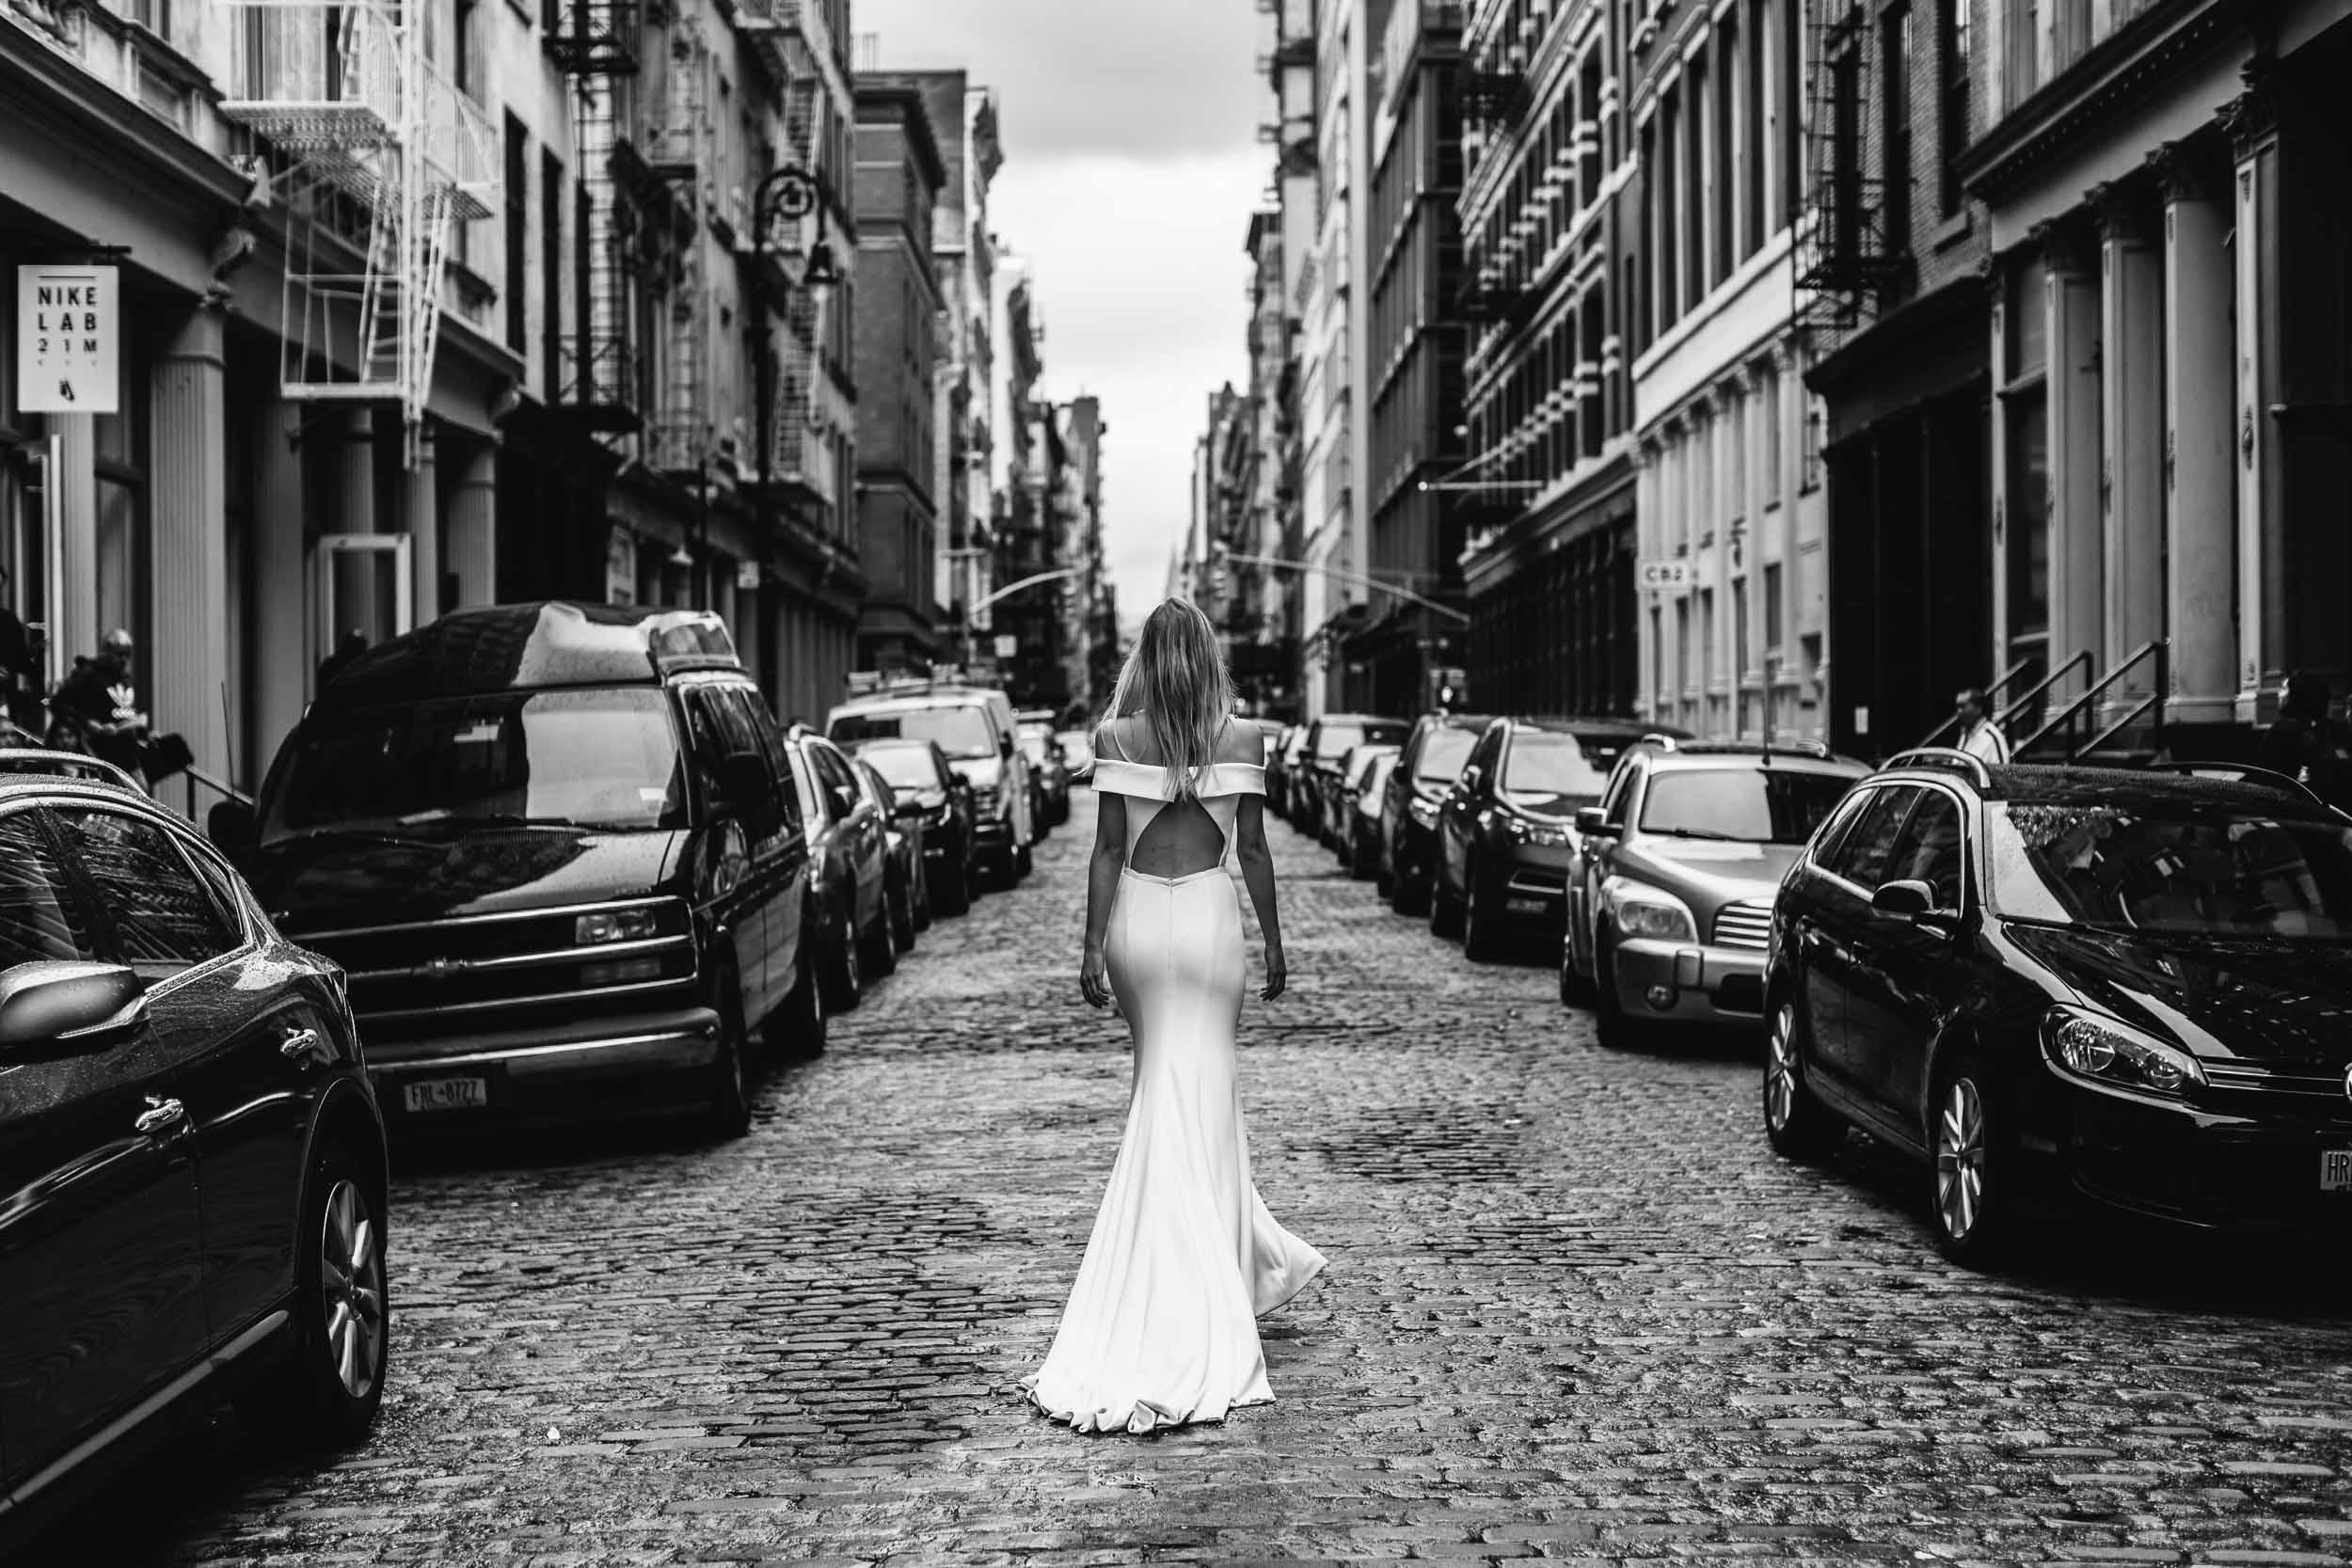 Kas-Richards-New-York-City-Wedding-Karen-Willis_Holmes-52.jpg